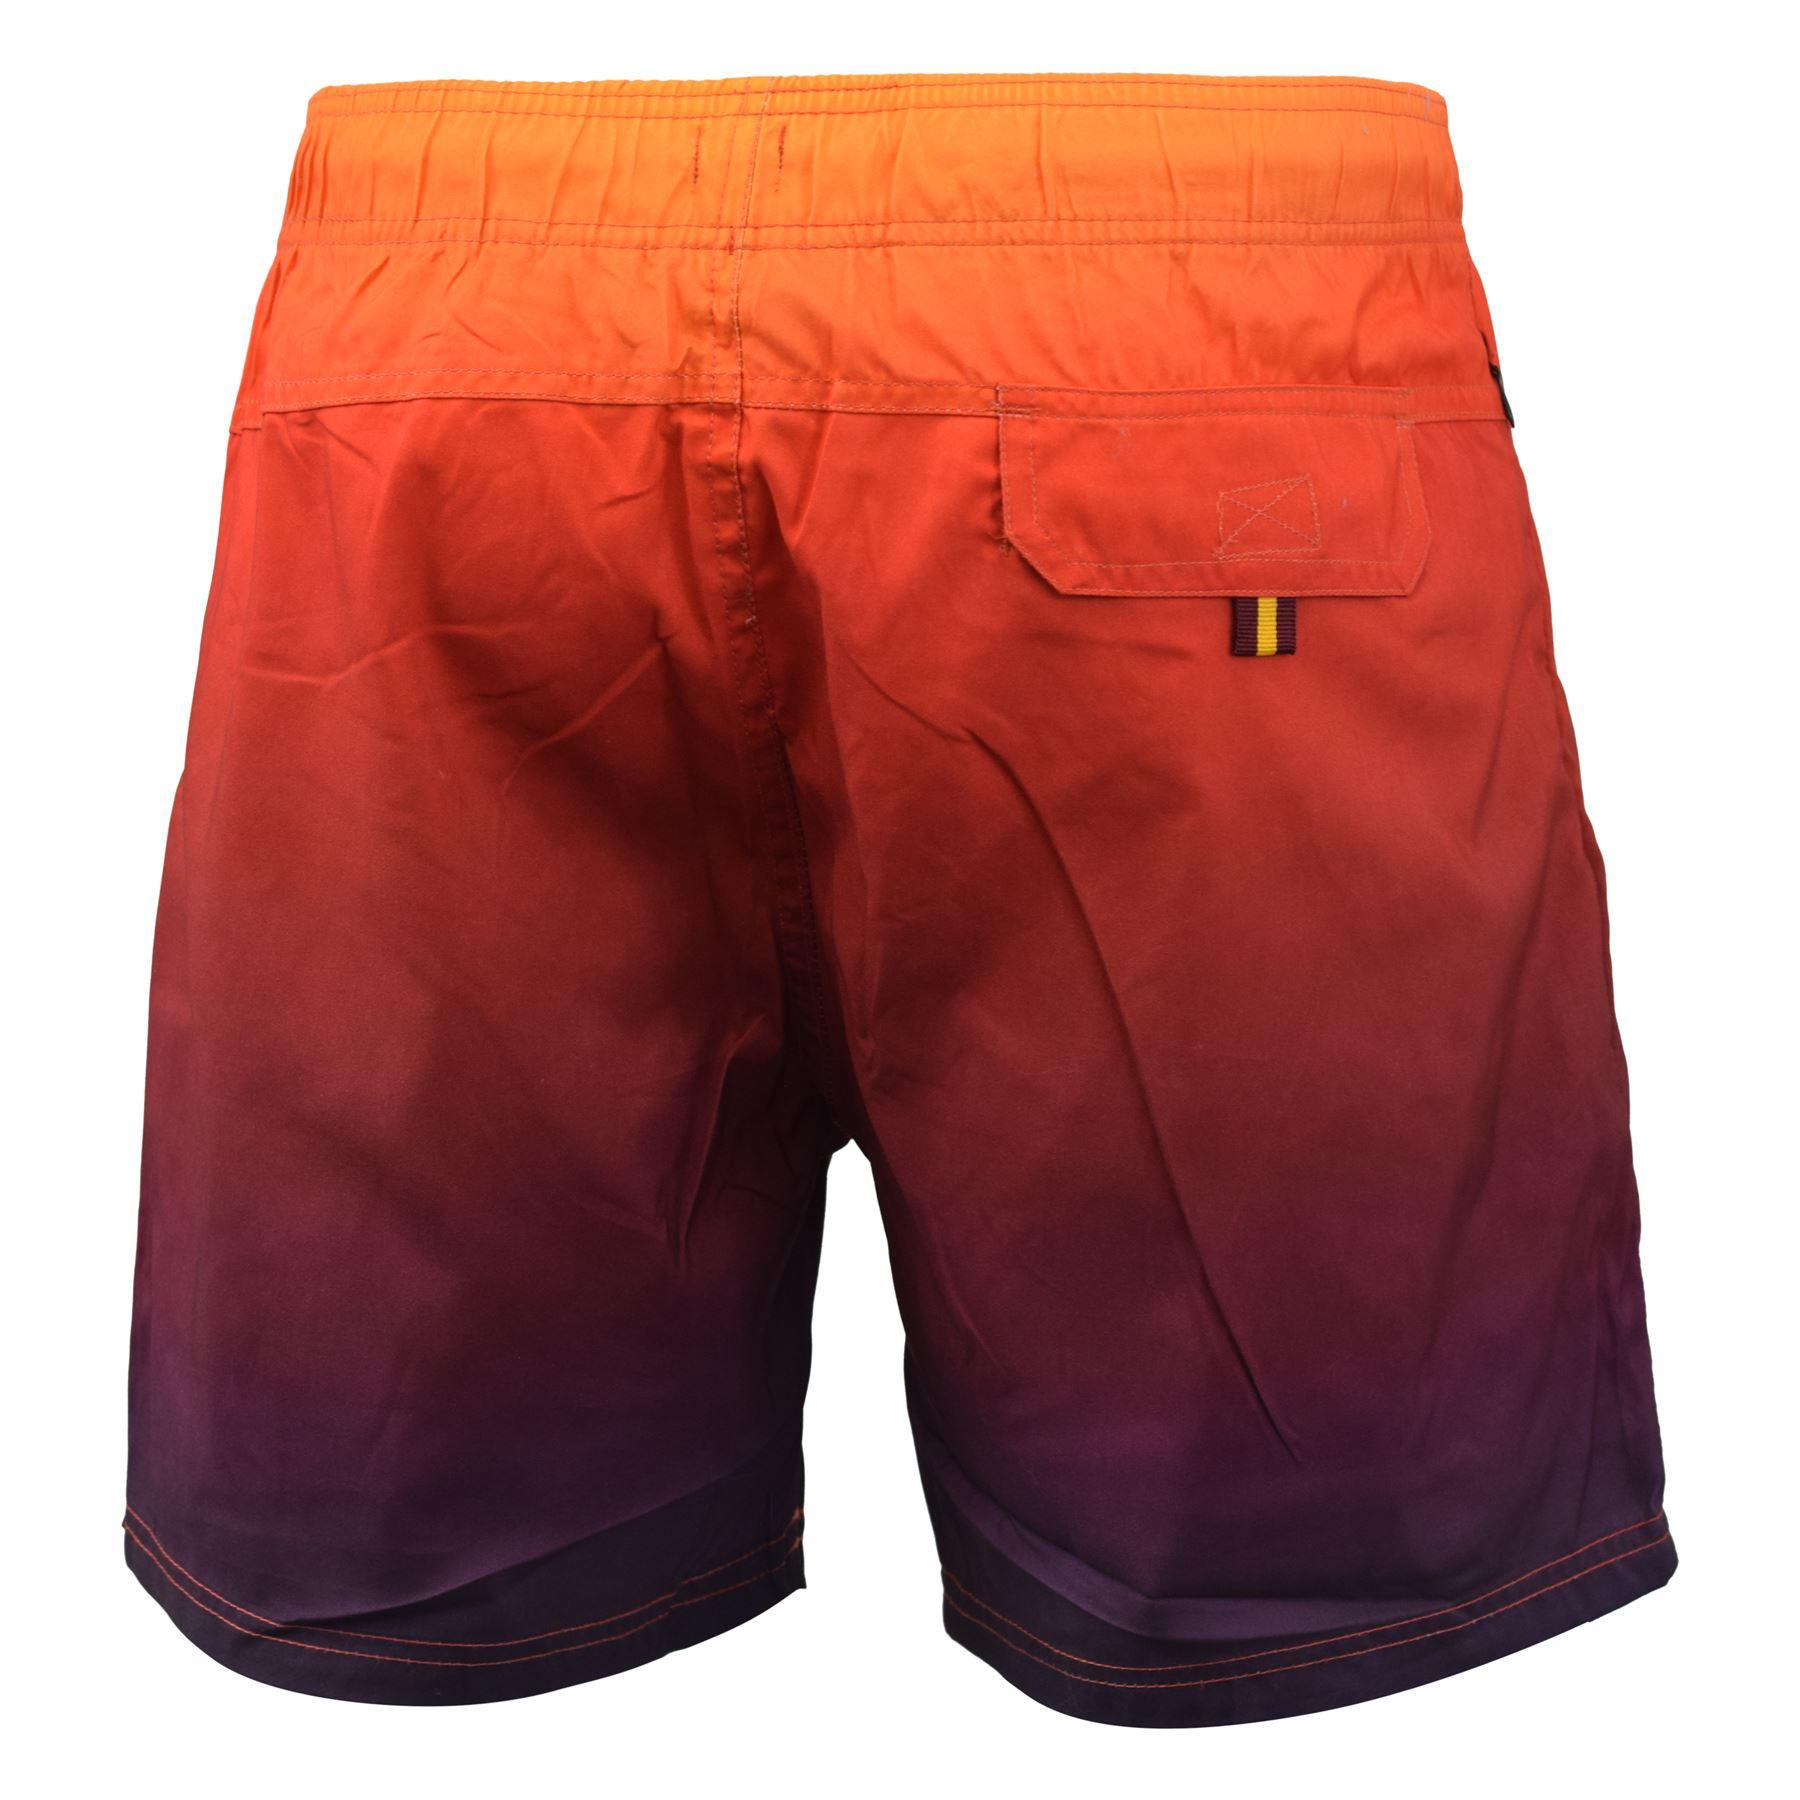 Mens Swim Short Crosshatch Norlane MeshLined Beach Shorts